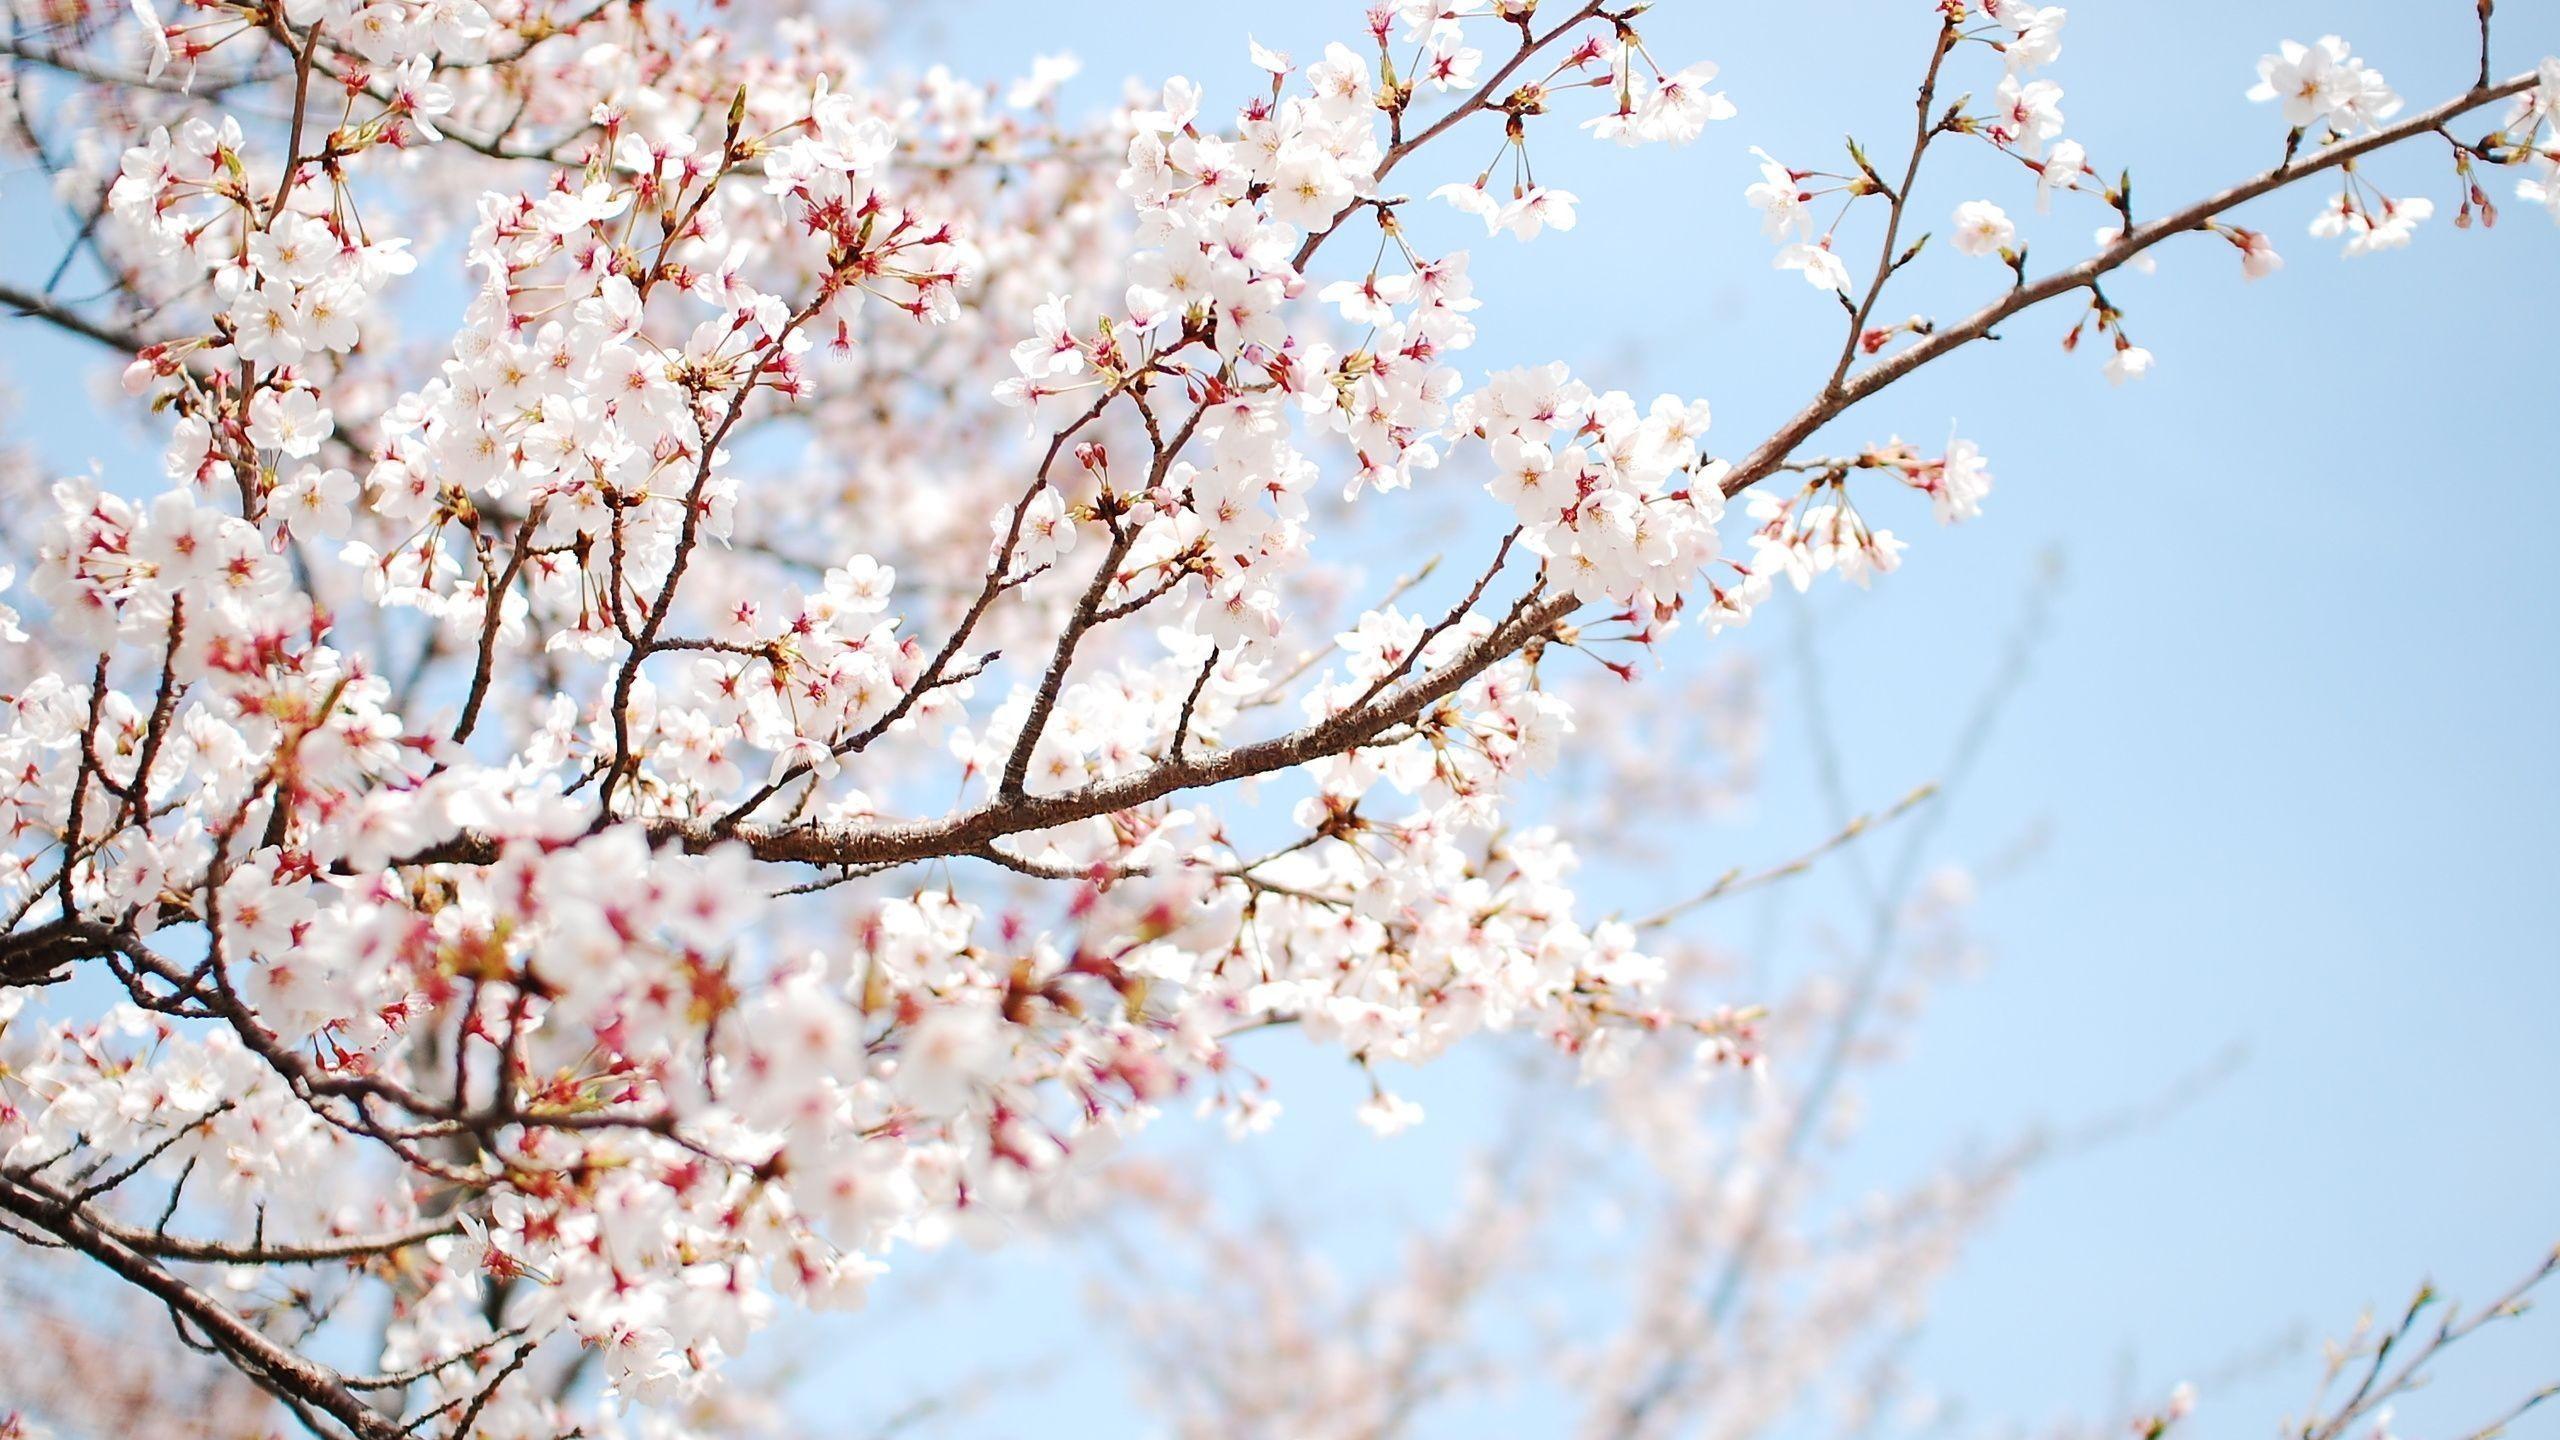 Cherry Blossom Tree Branch – wallpaper.